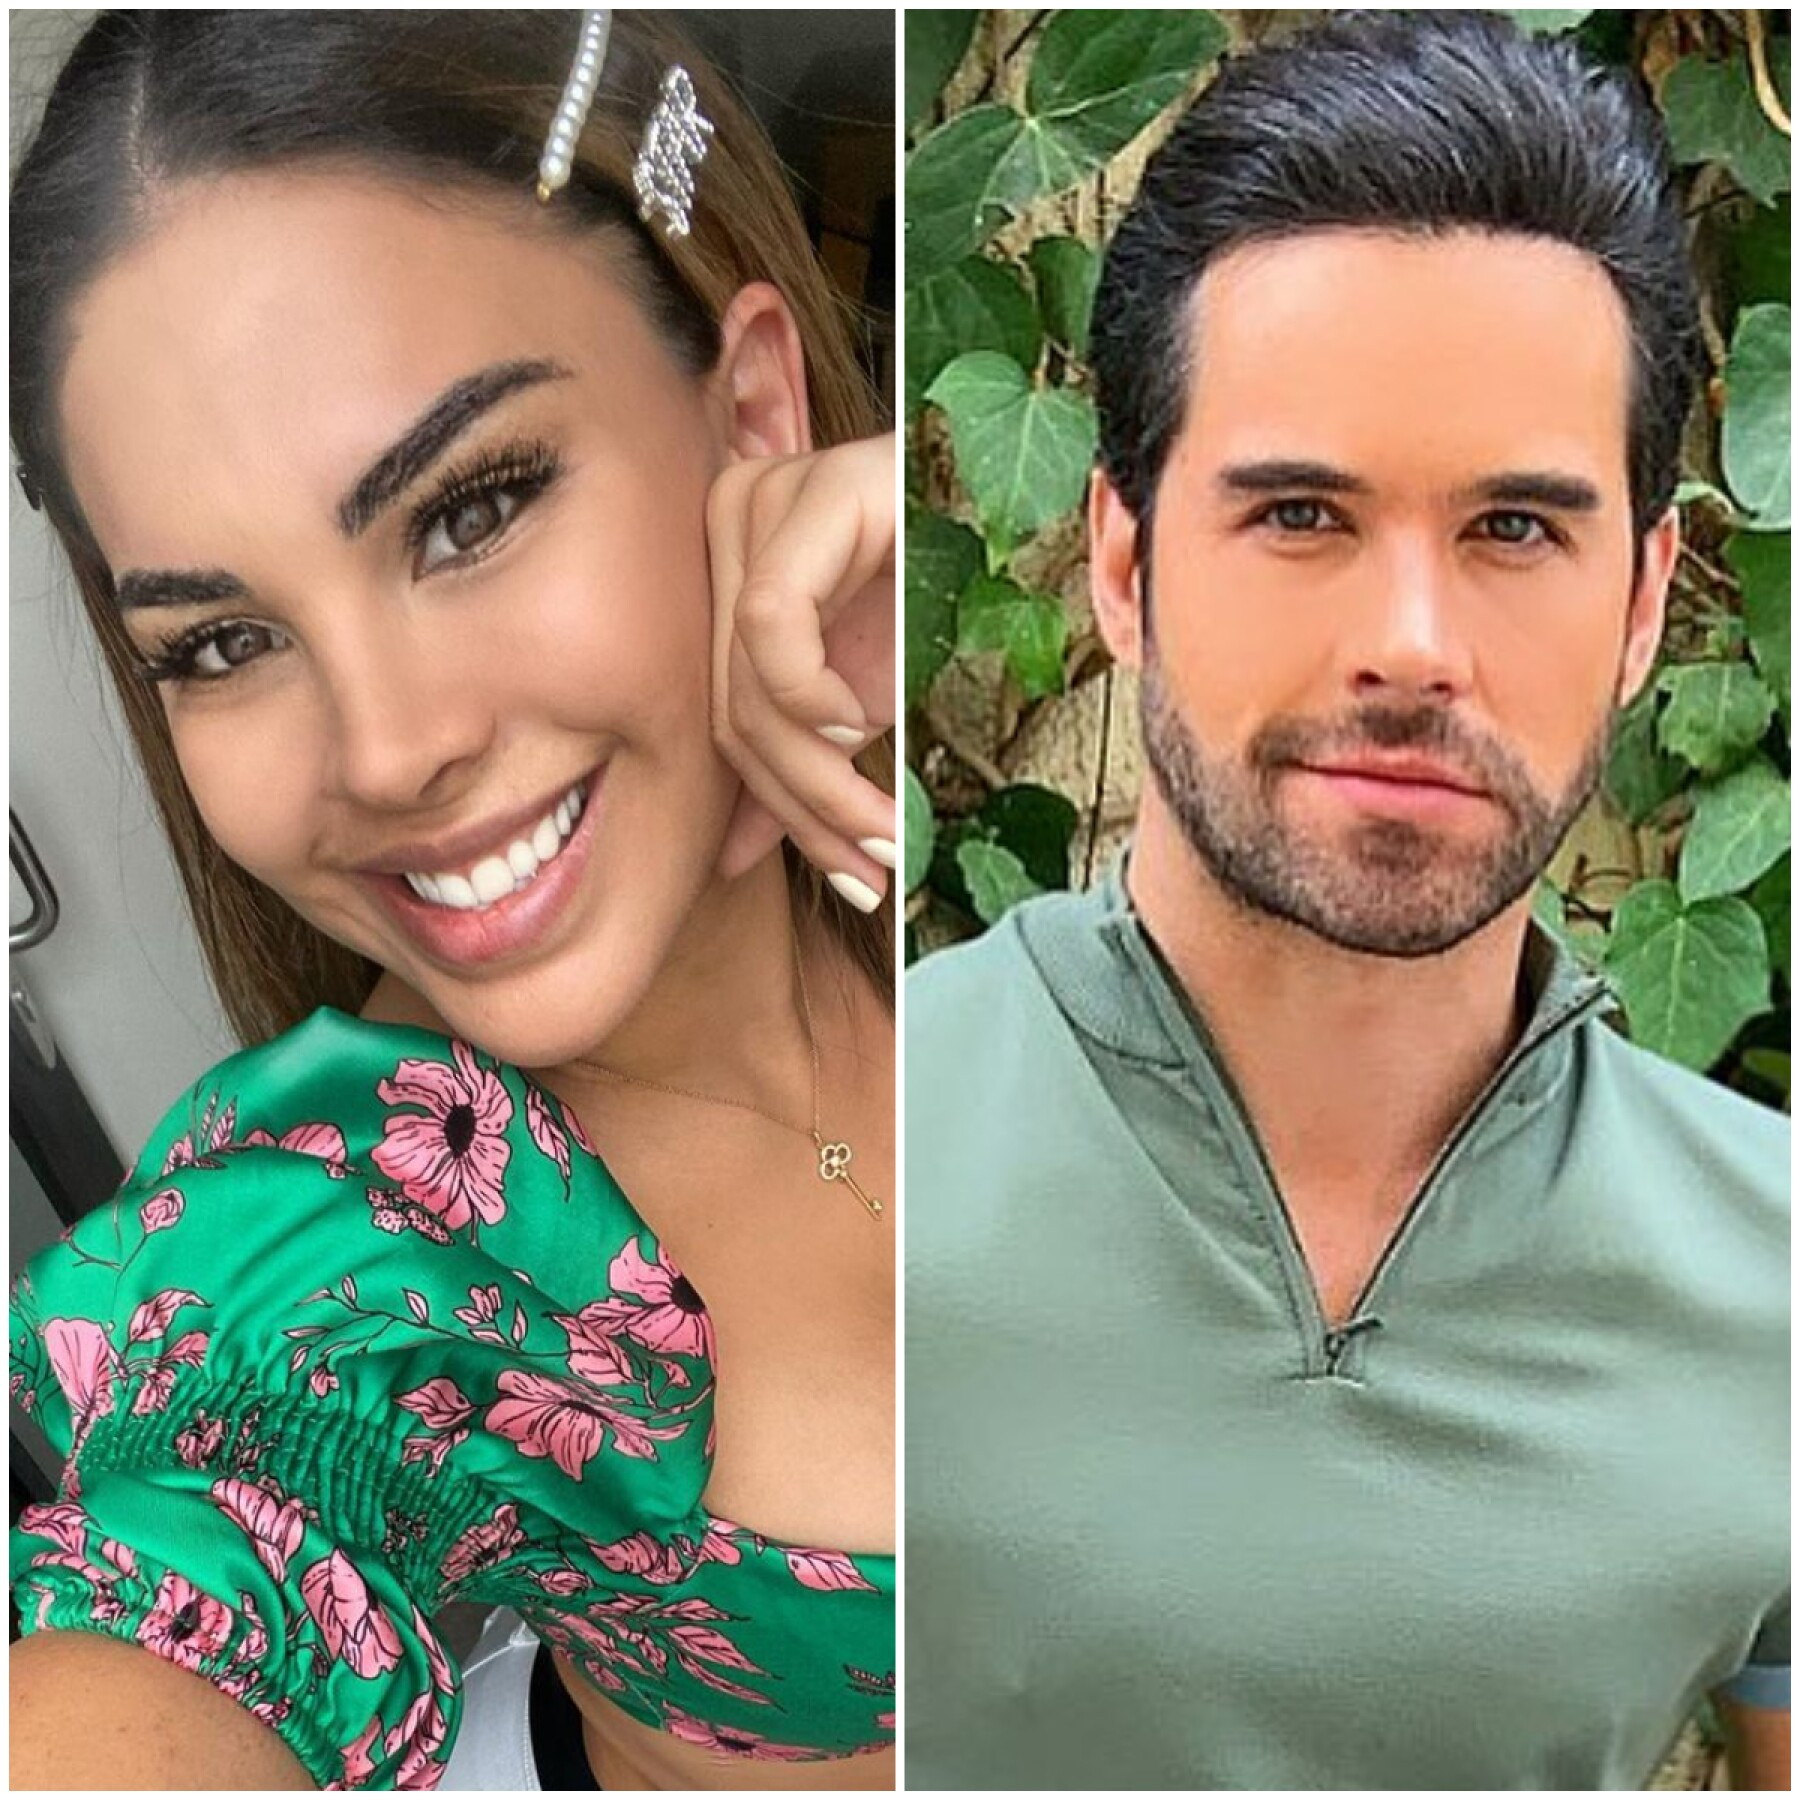 Tefi Valenzuela y Eleazar Gomez